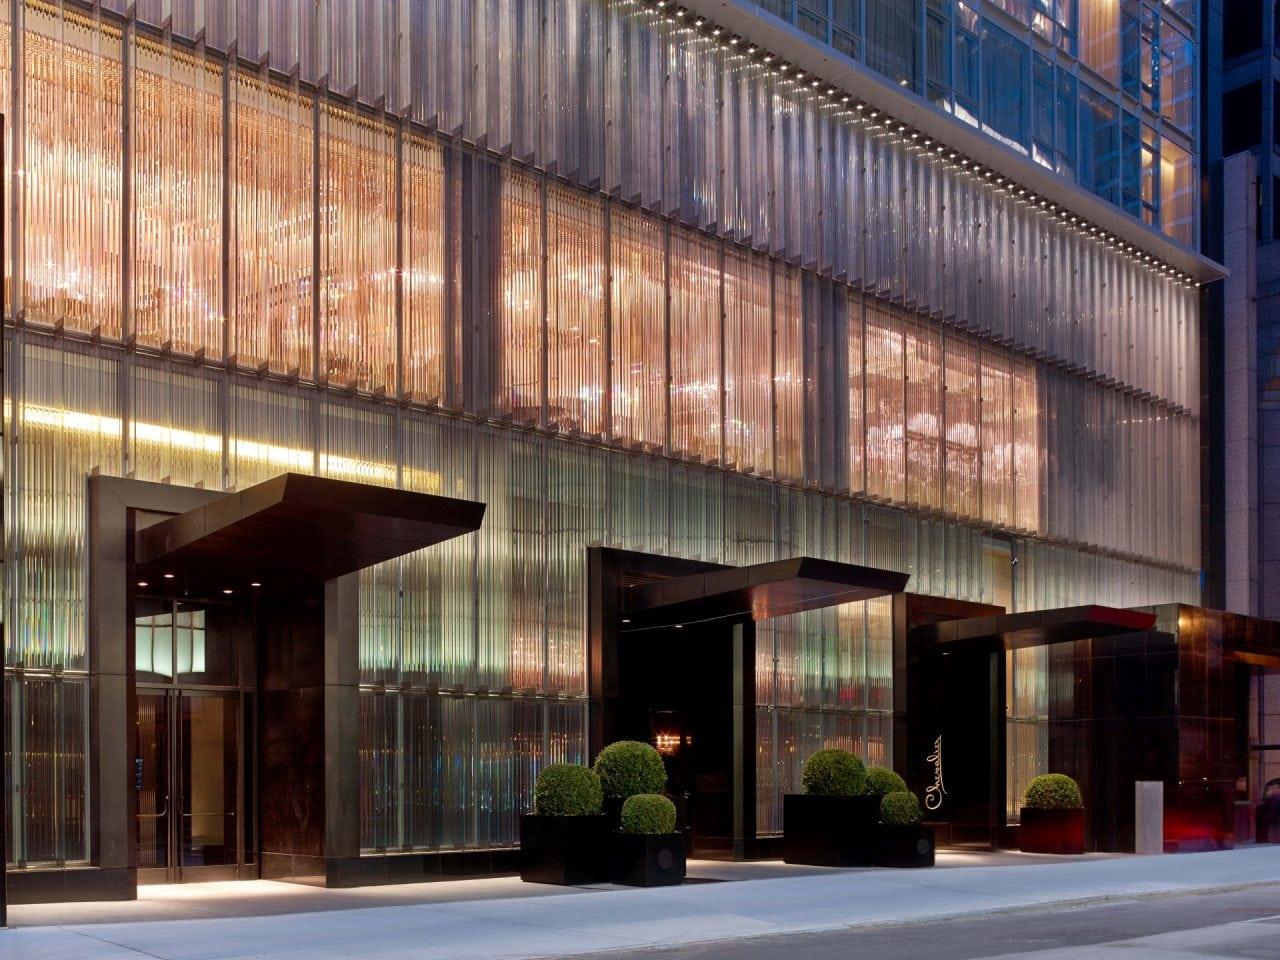 Baccarat Hotel NYC March 2015 3 2 - Baccarat: Stralucind ca nou simbol al Manhattan-ului